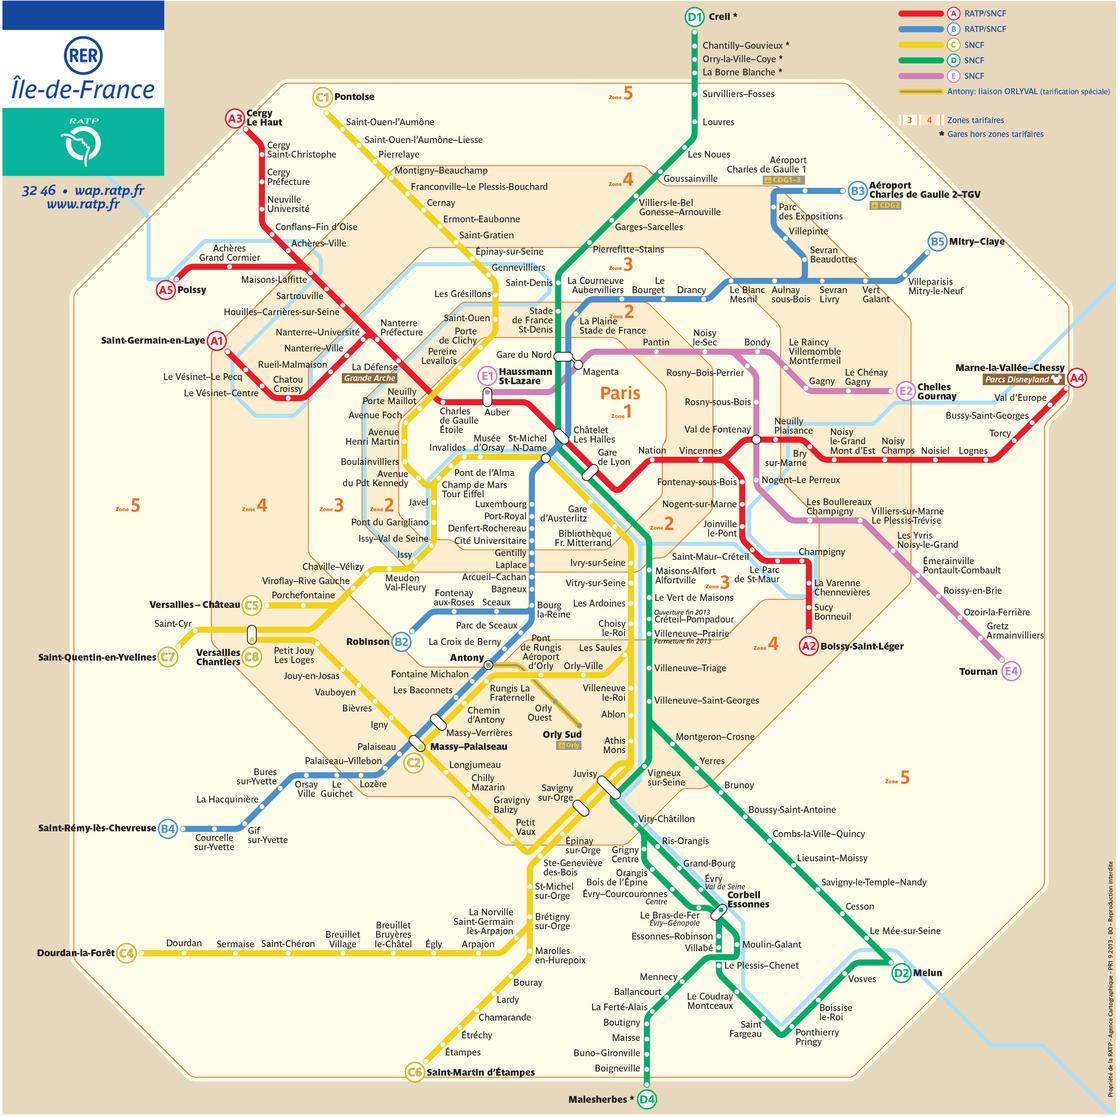 Metro Og Kort Over Paris